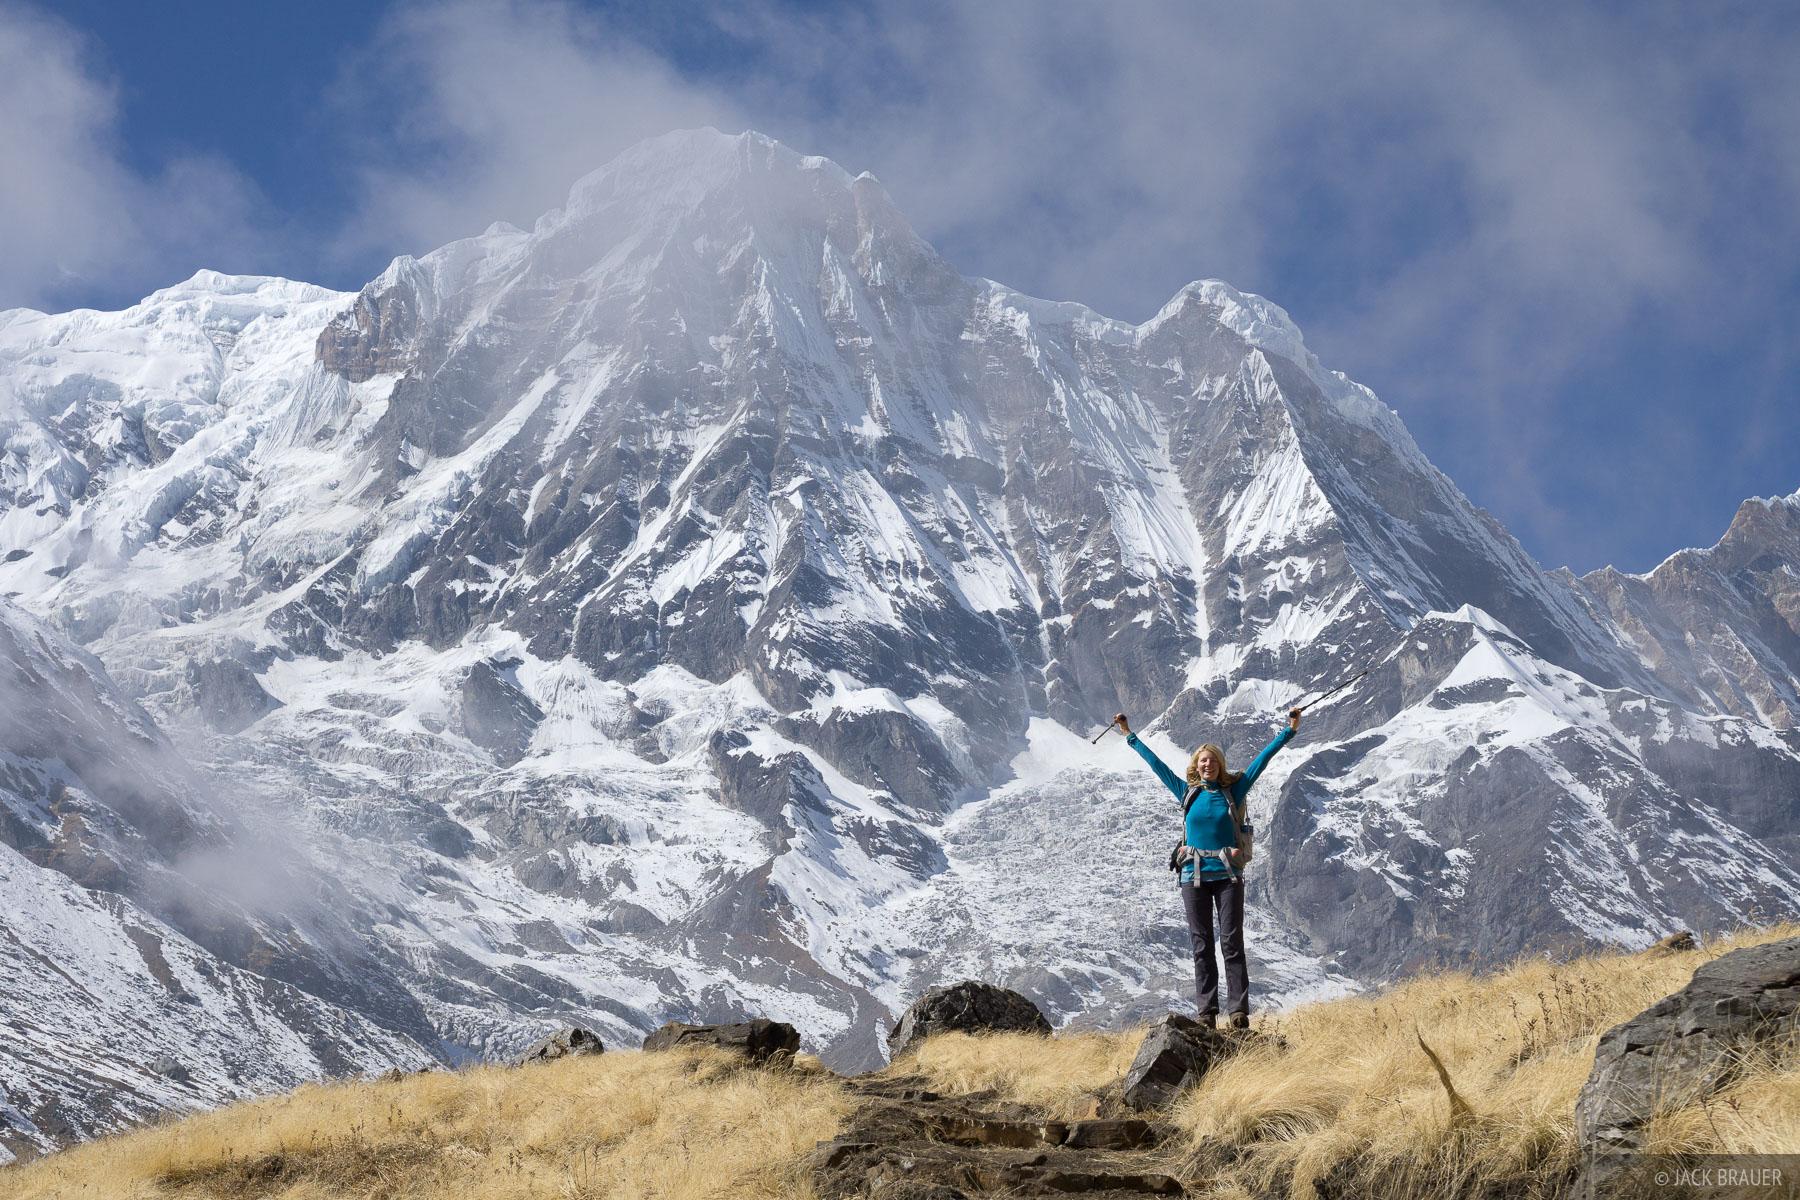 Annapurna South, Annpurna Range, Asia, Himalaya, Nepal, hiking, photo